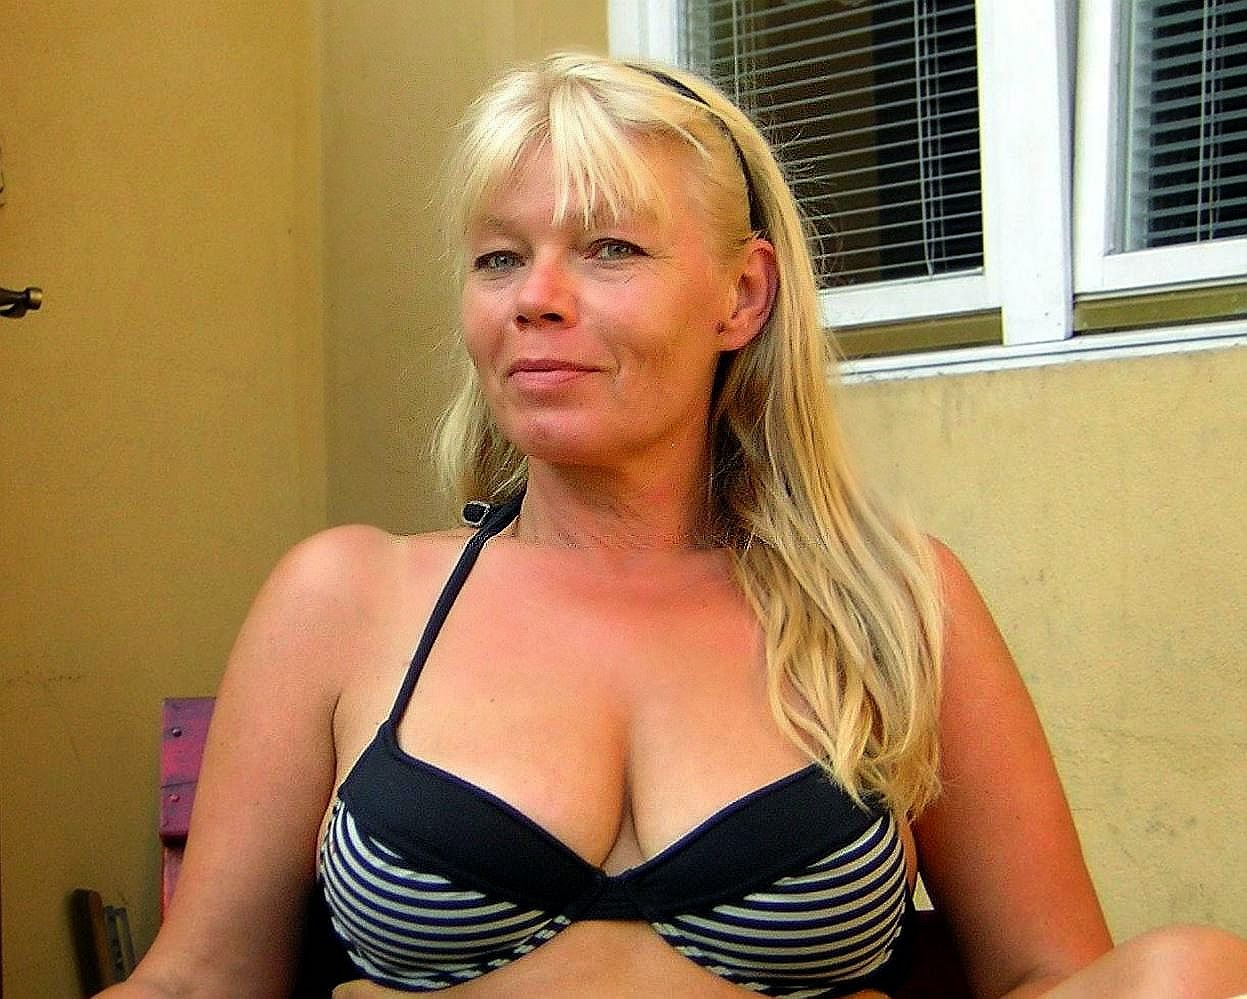 Local 50 To 55 Divorced Woman Seeking Man